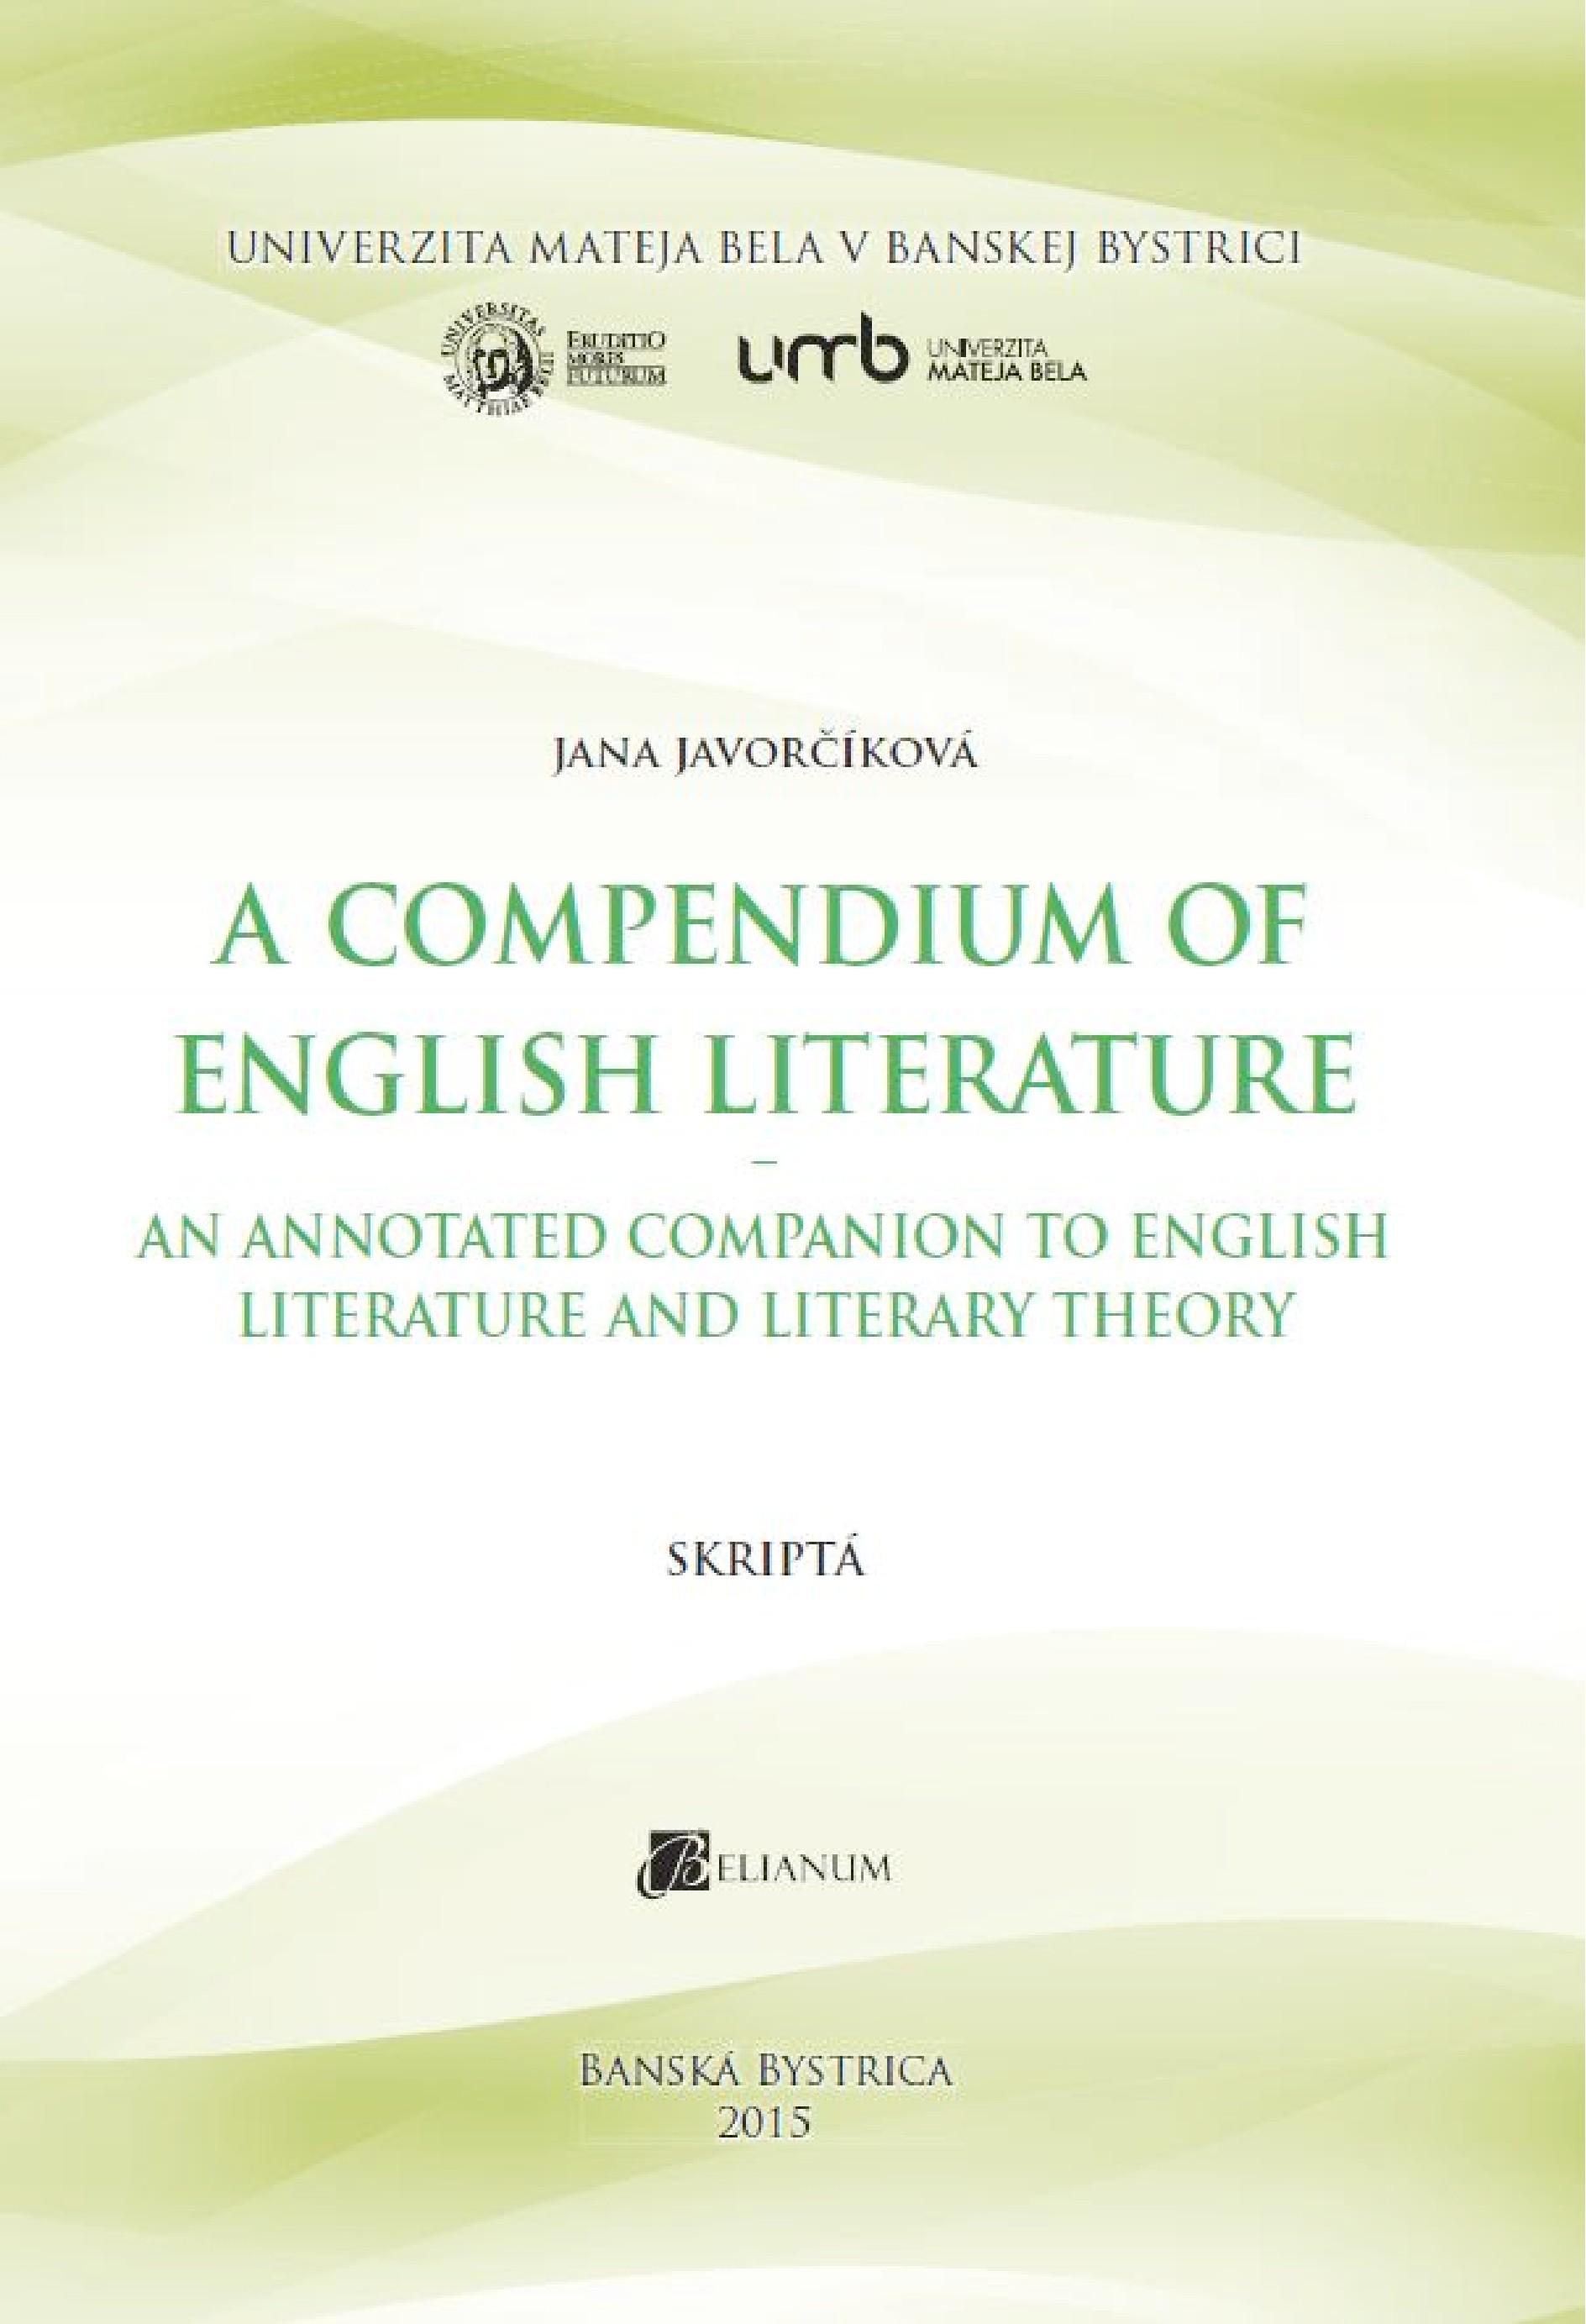 A Compendium of English Literature - An Annotated Companion to English Literature and Literary Theory